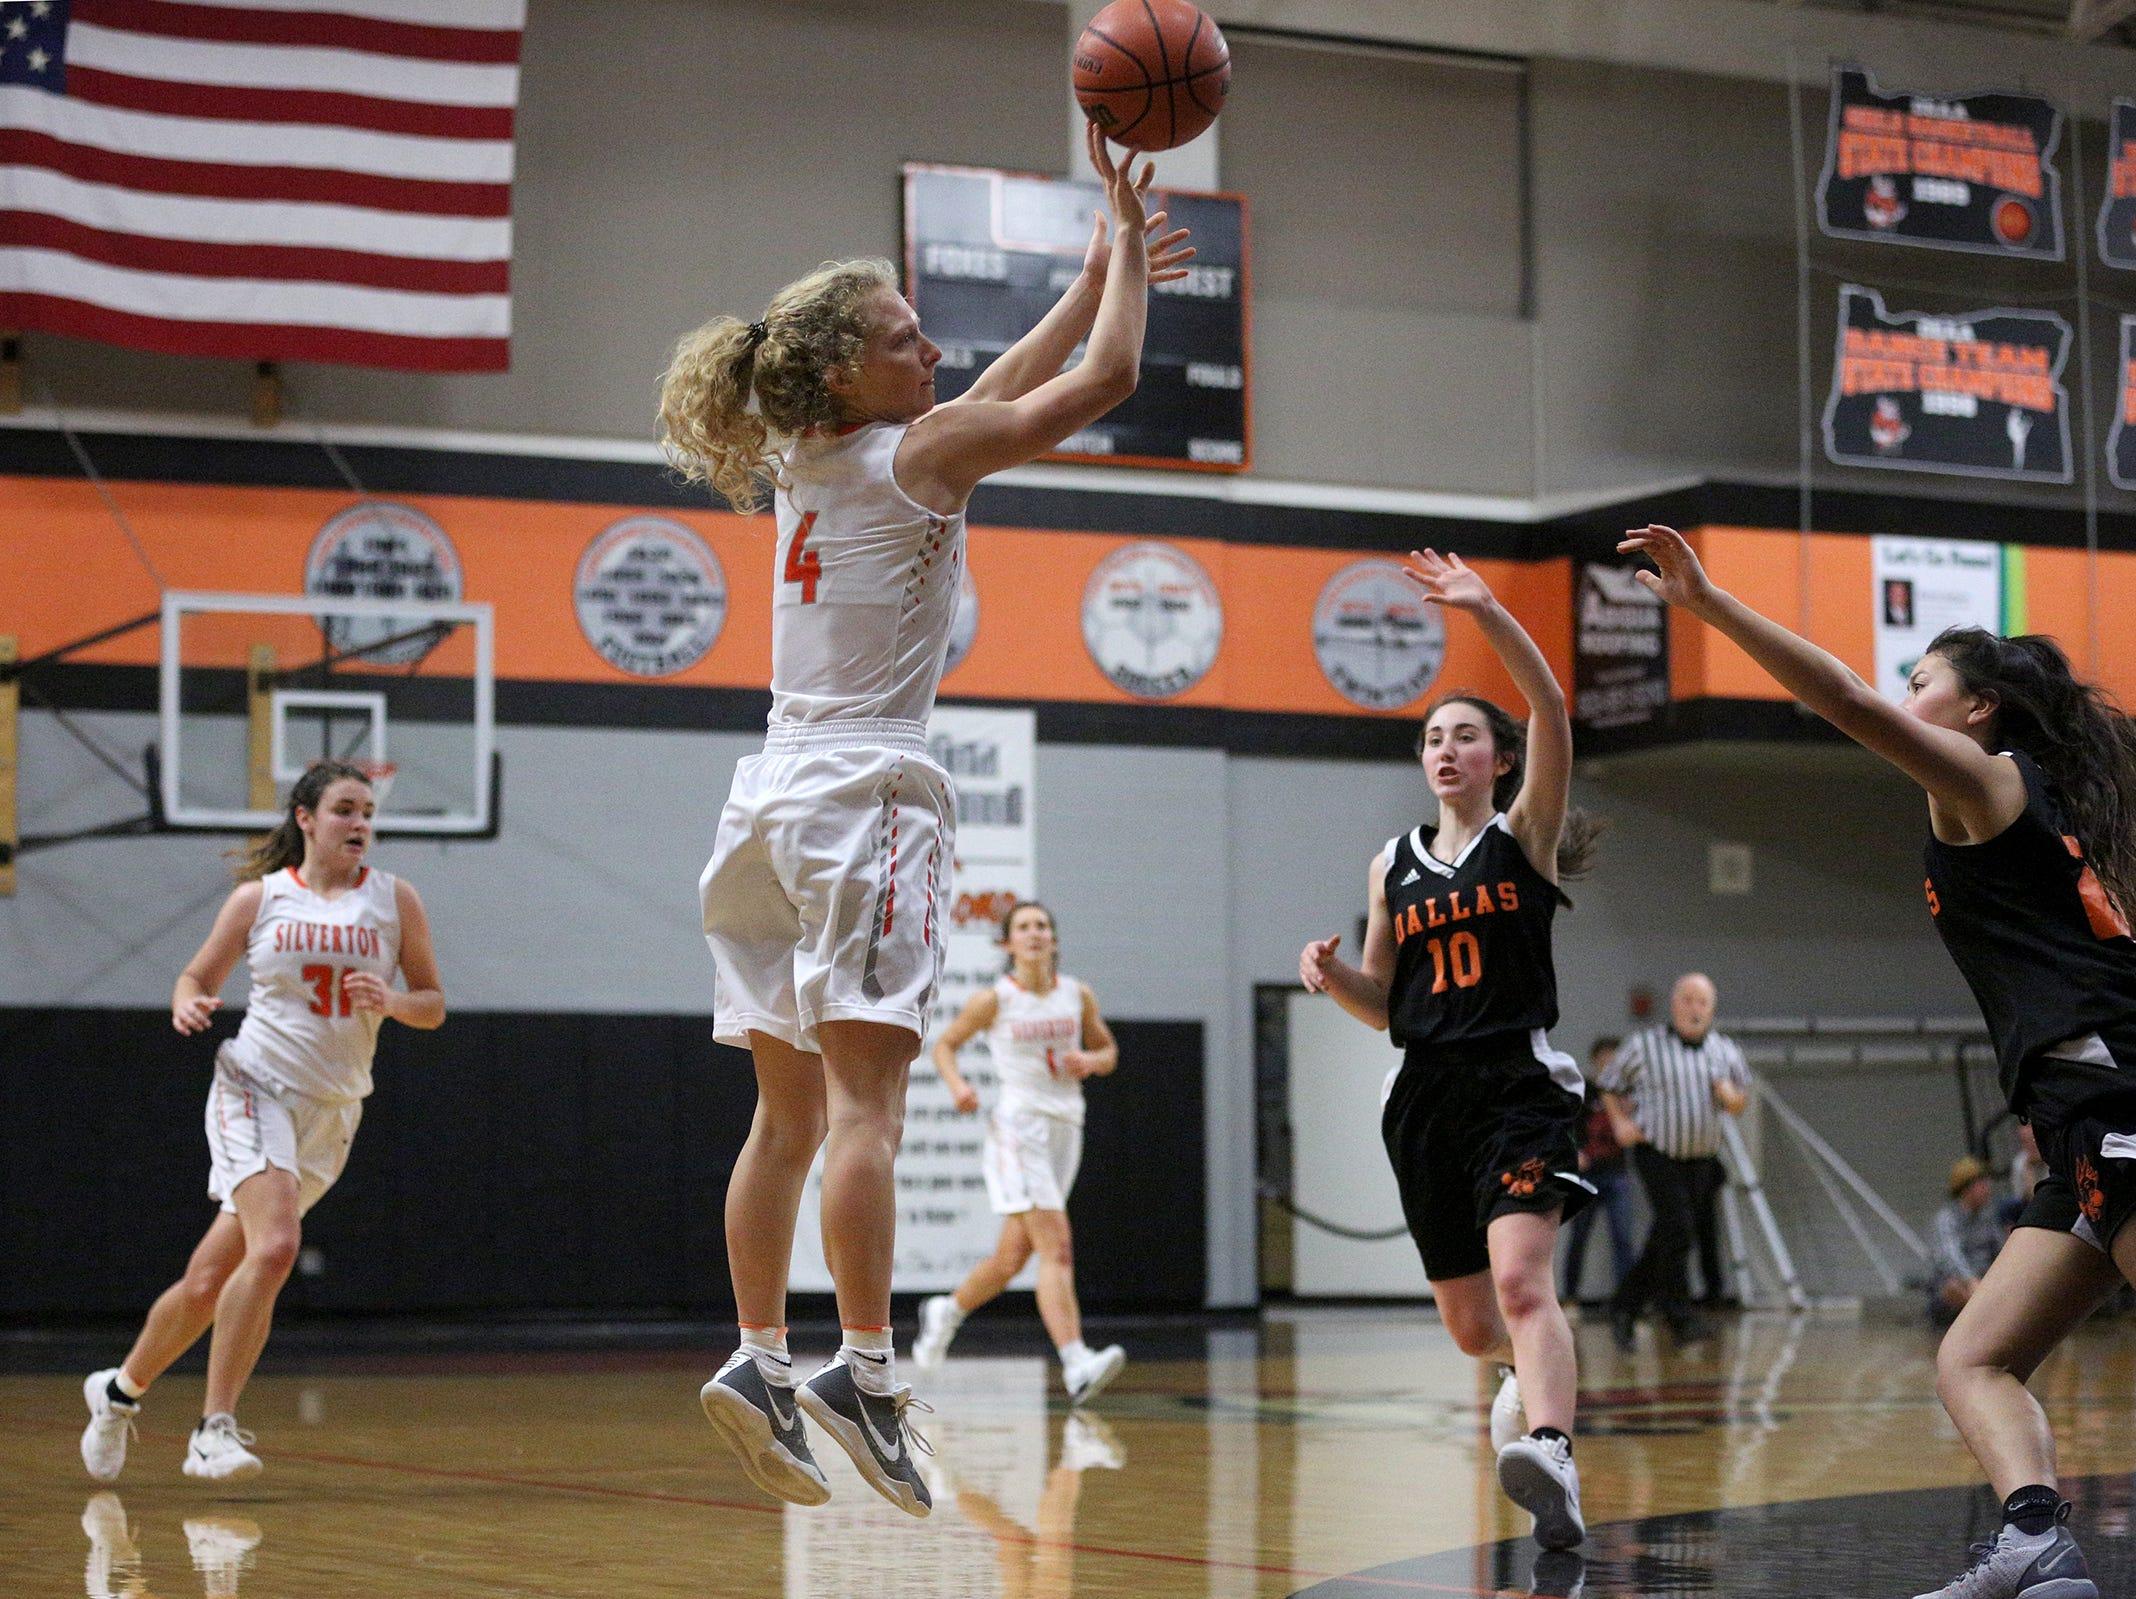 Silverton's Ellie Schmitz (4) attempts a shot during the Dallas High School vs. Silverton High School girls basketball game in Silverton on Tuesday, Dec. 8, 2019.